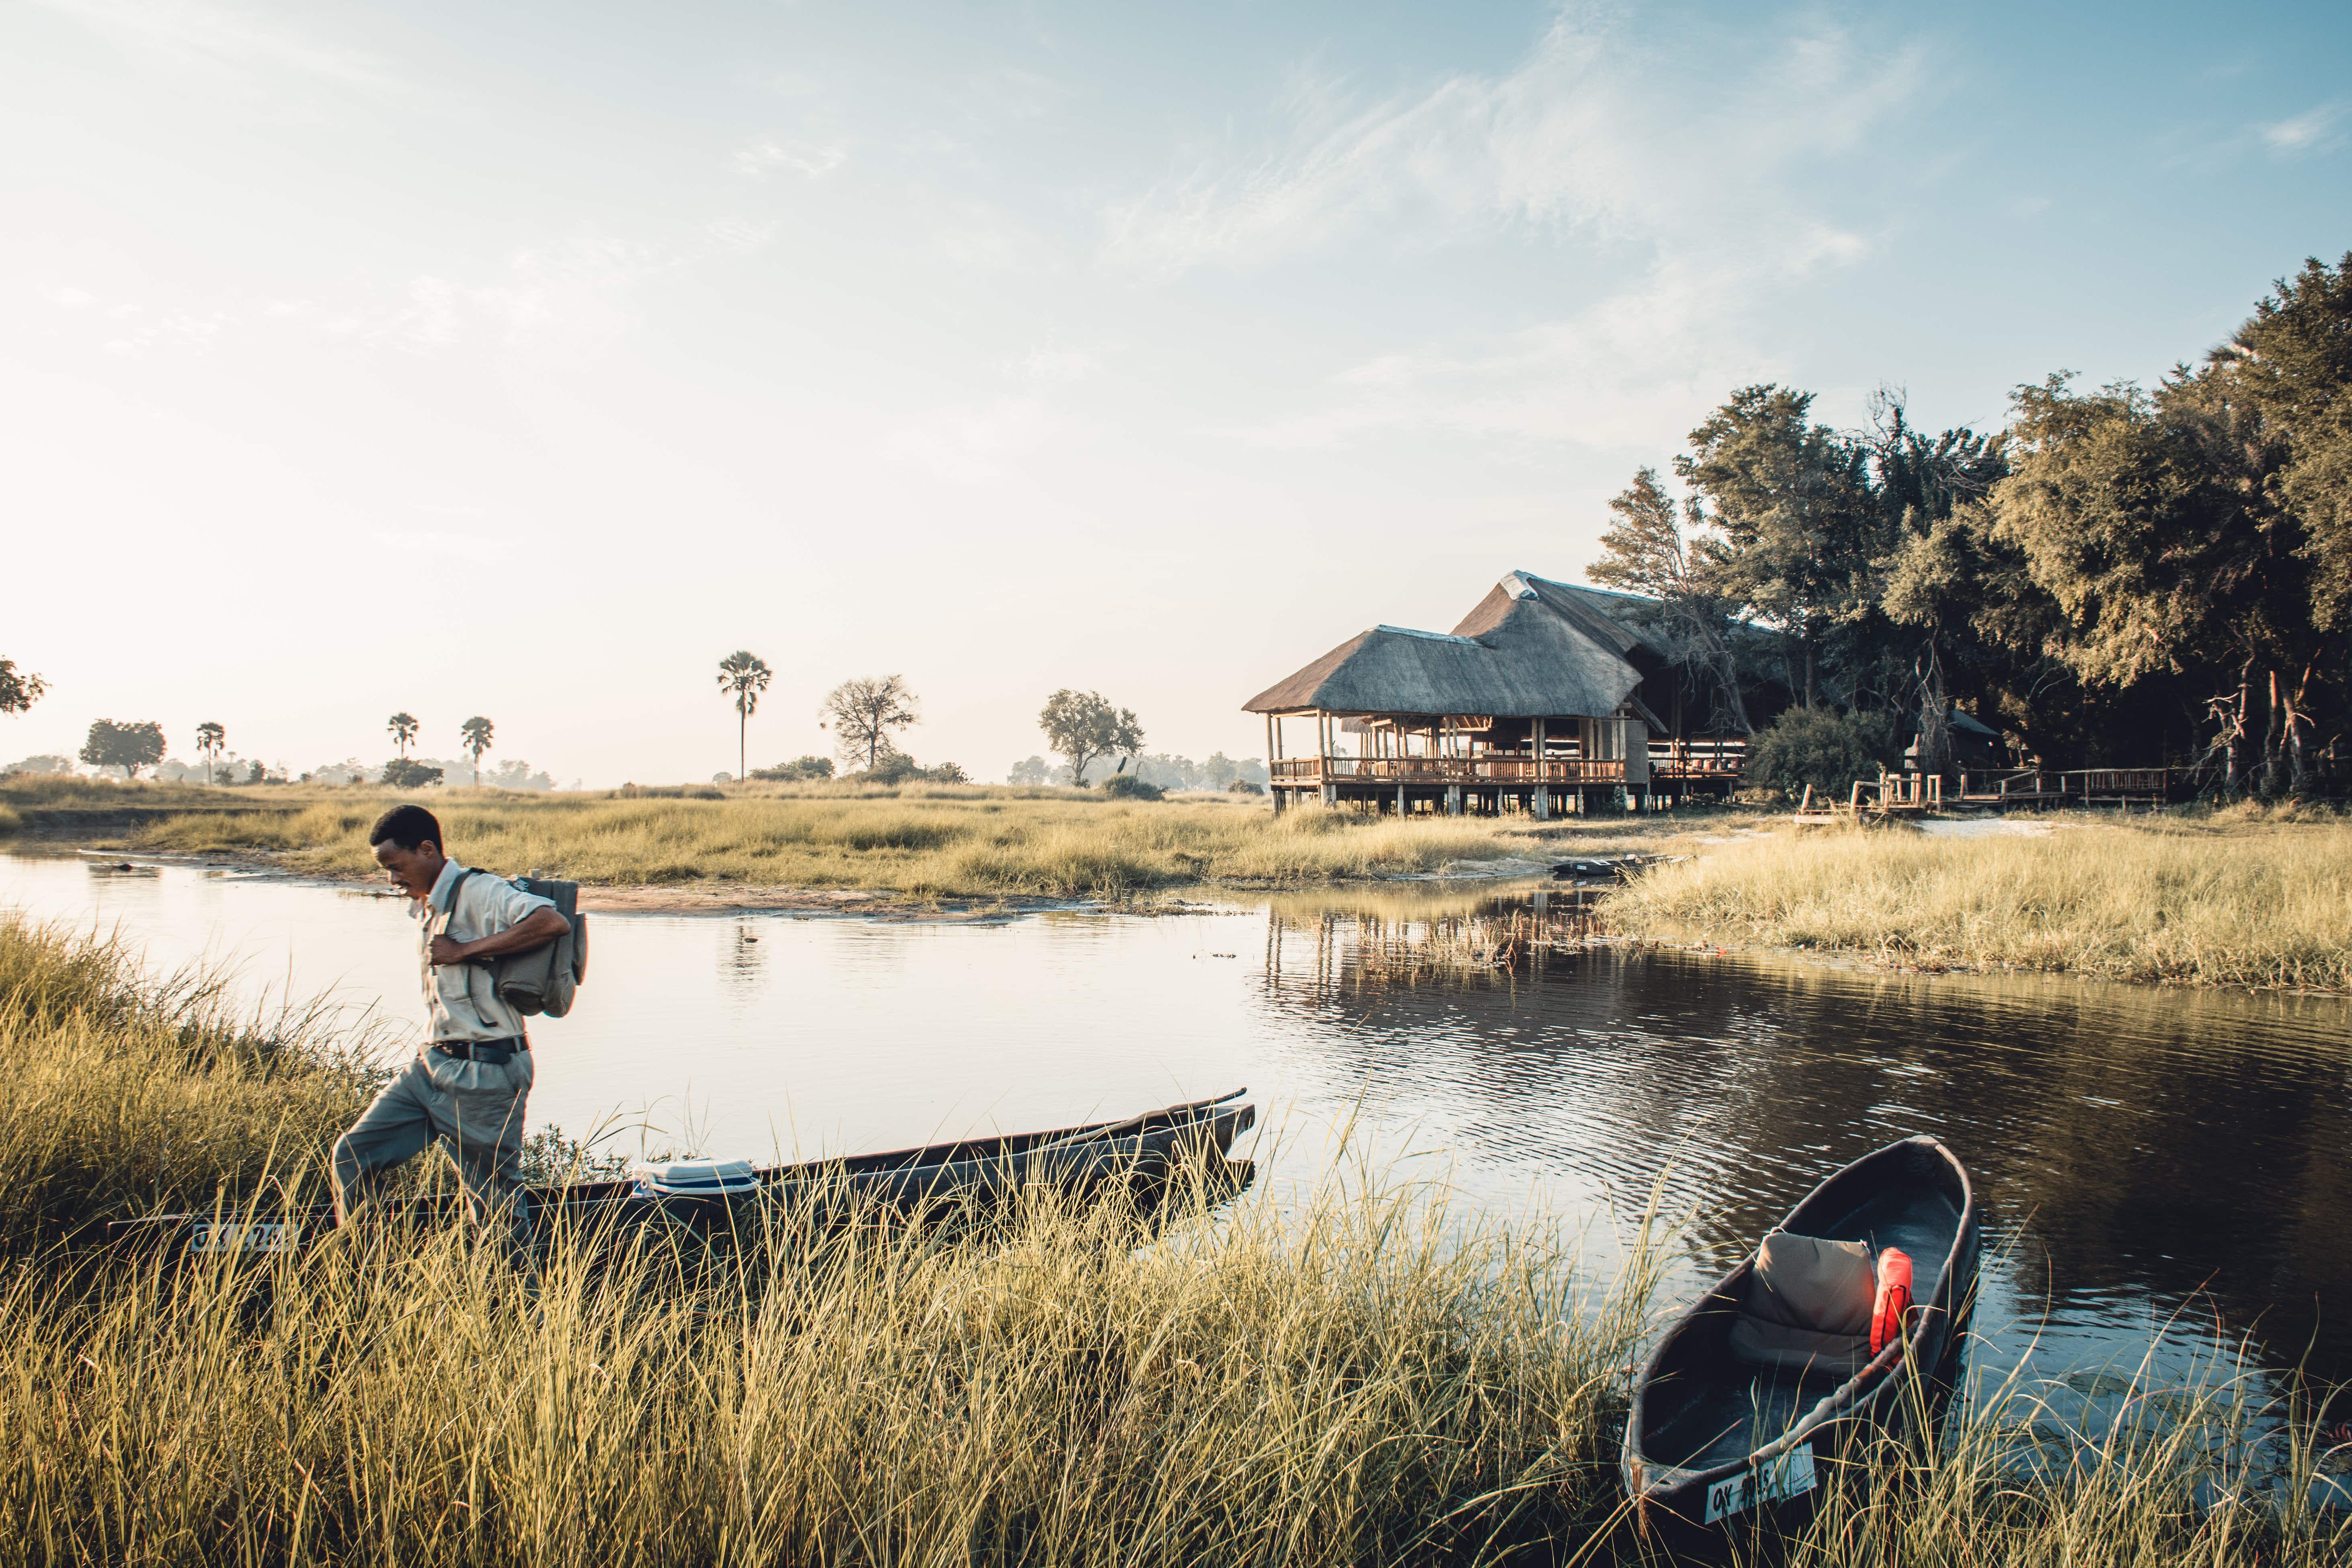 Botswana walking safaris let you slow down and savor the Kalahari